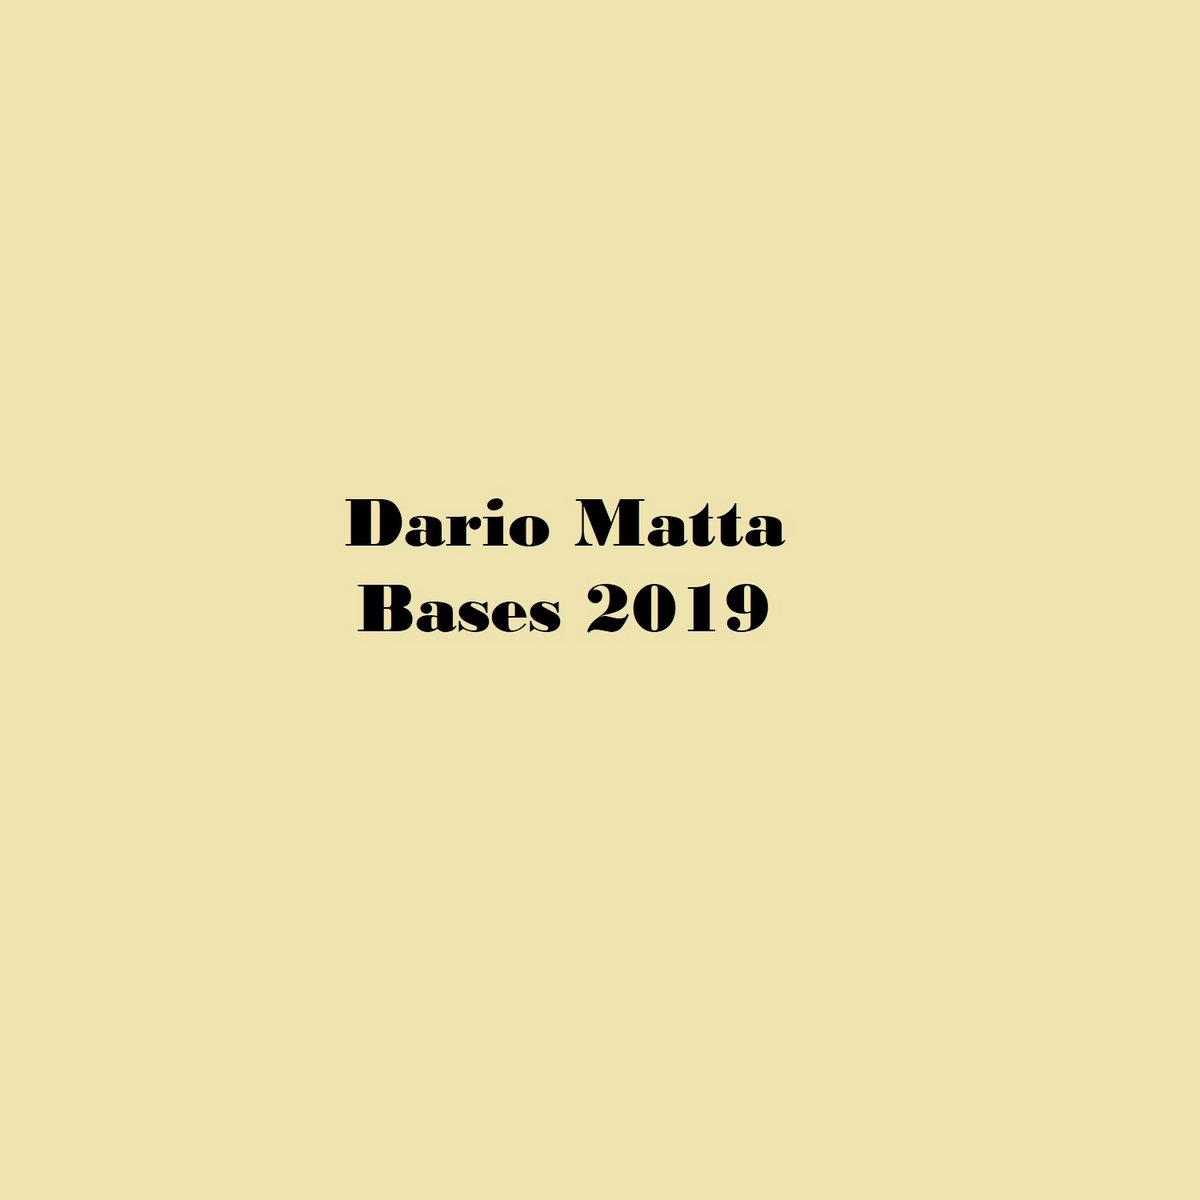 Dario Matta Bases 2019